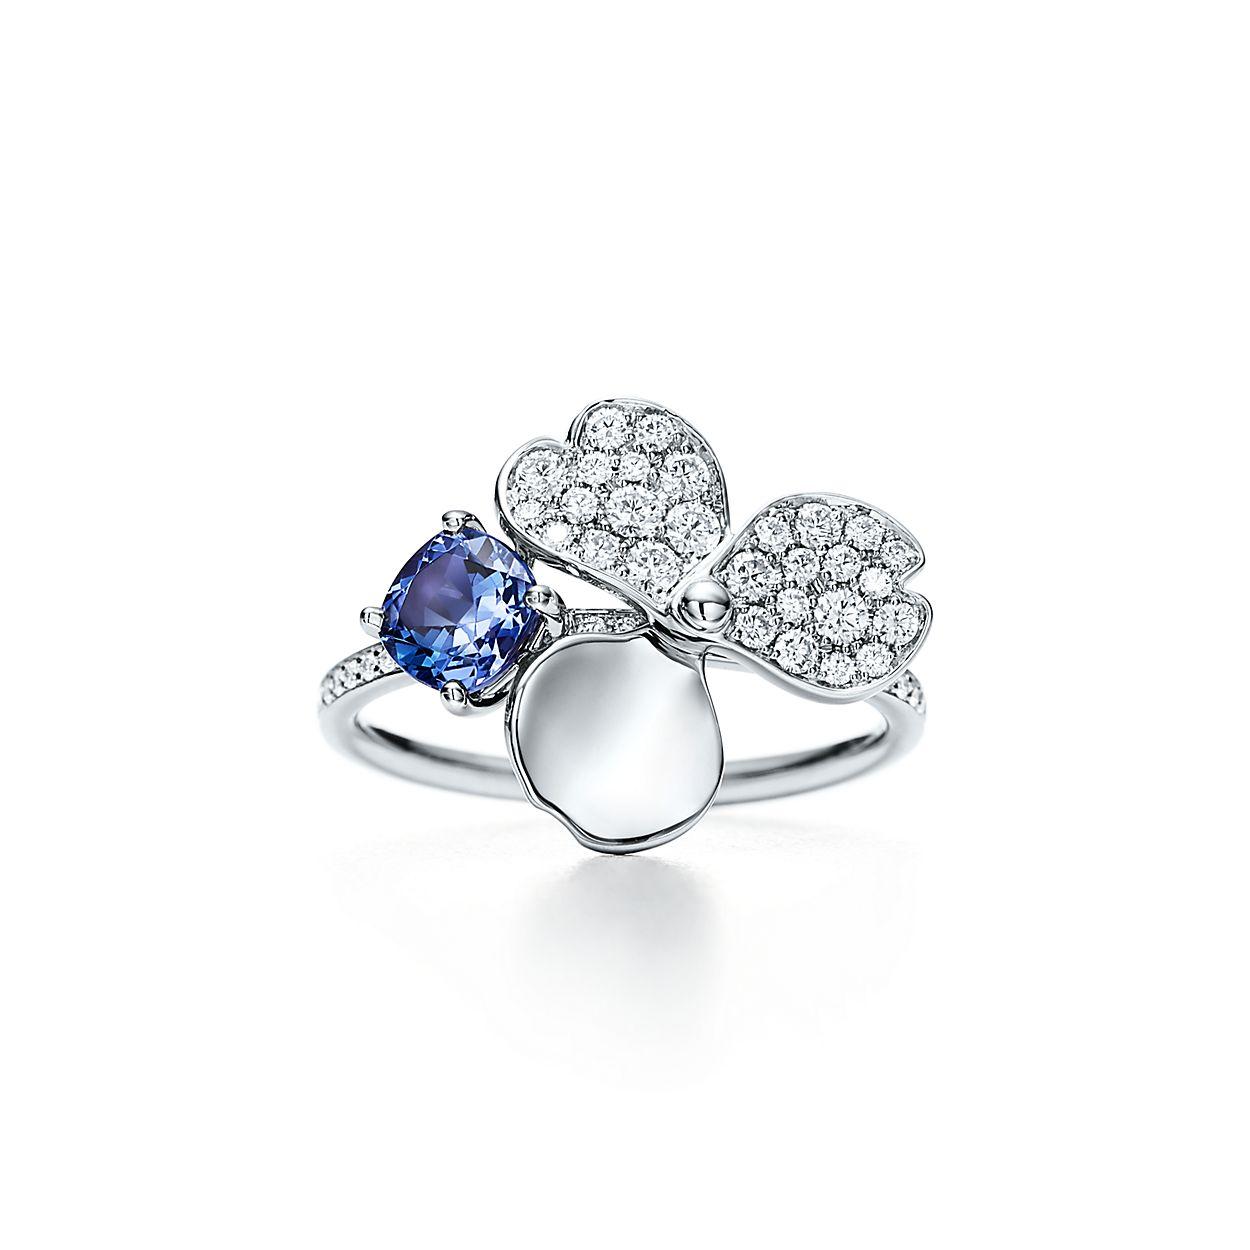 Tiffany paper flowers diamond and tanzanite flower ring in platinum tiffany paper flowersdiamond and tanzanitebrflower ring izmirmasajfo